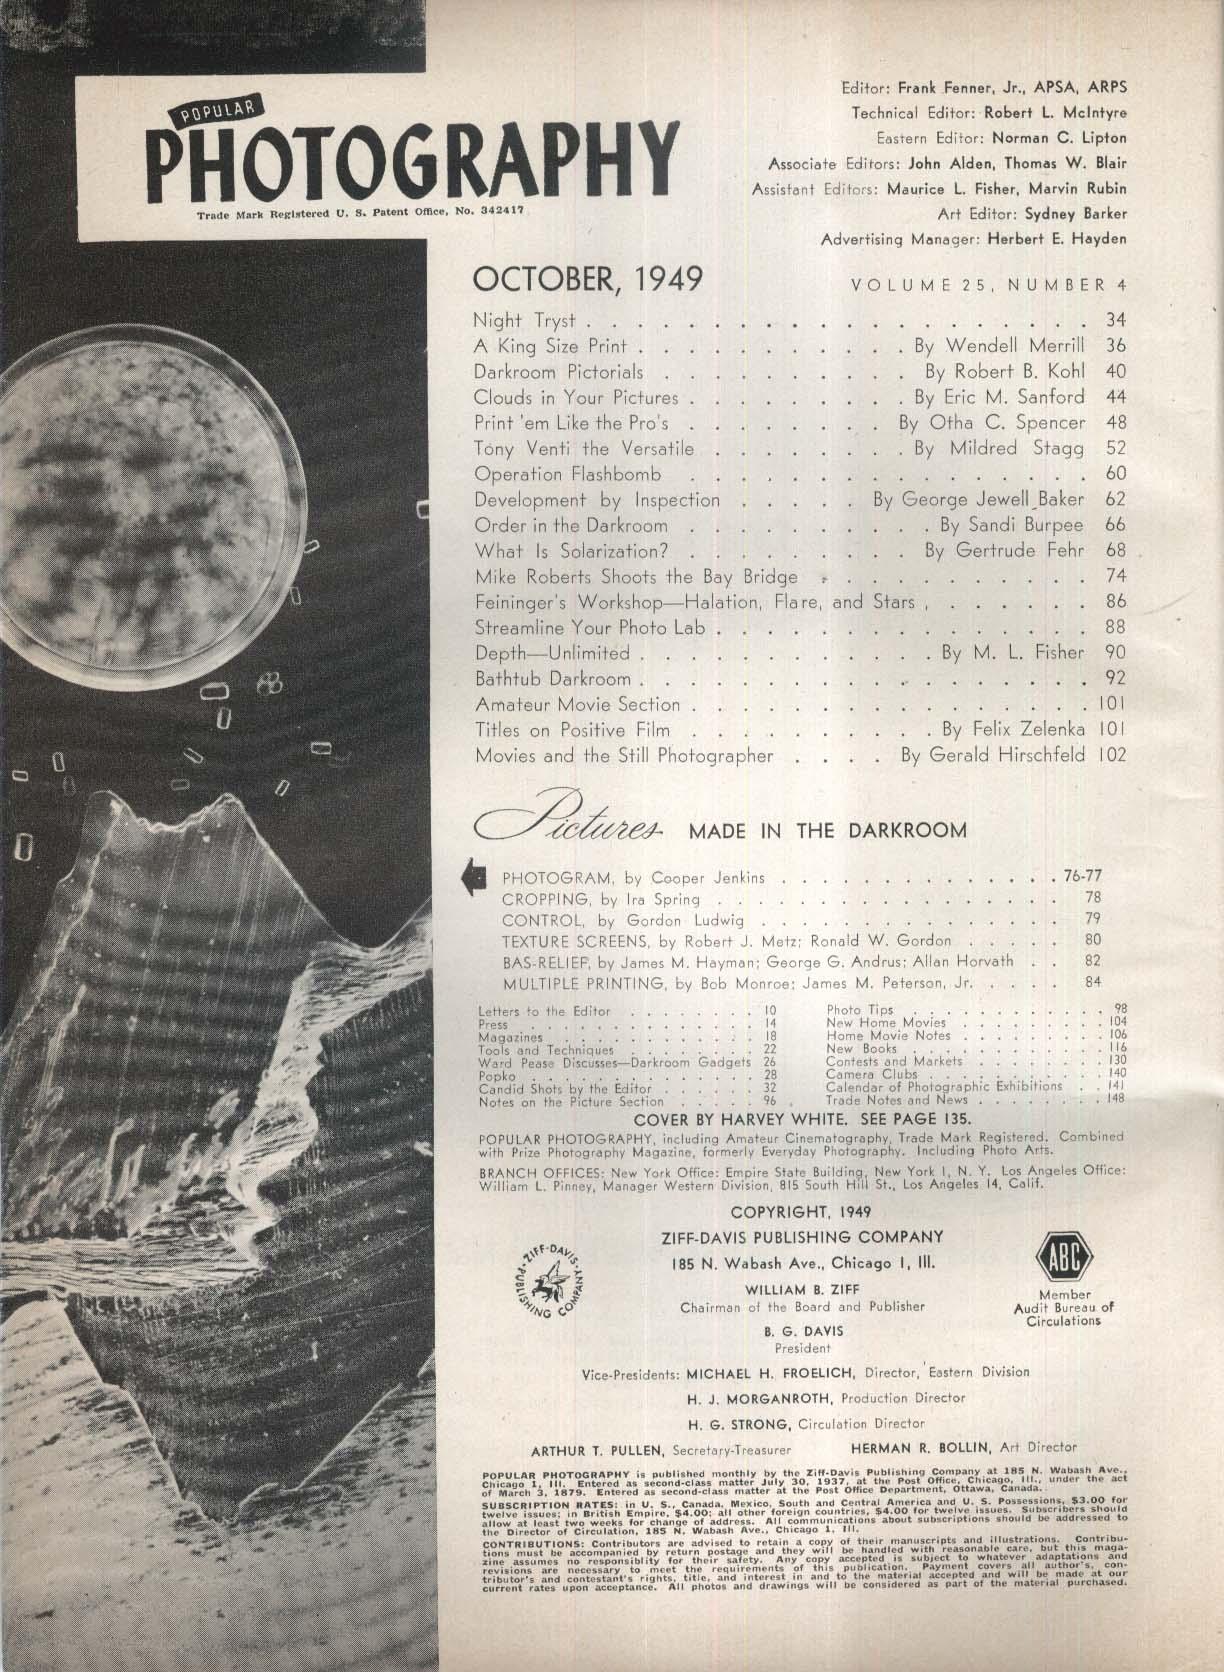 POPULAR PHOTOGRAPHY Tony Venti Mike Roberts Feininger Workshop Halation 10 1949